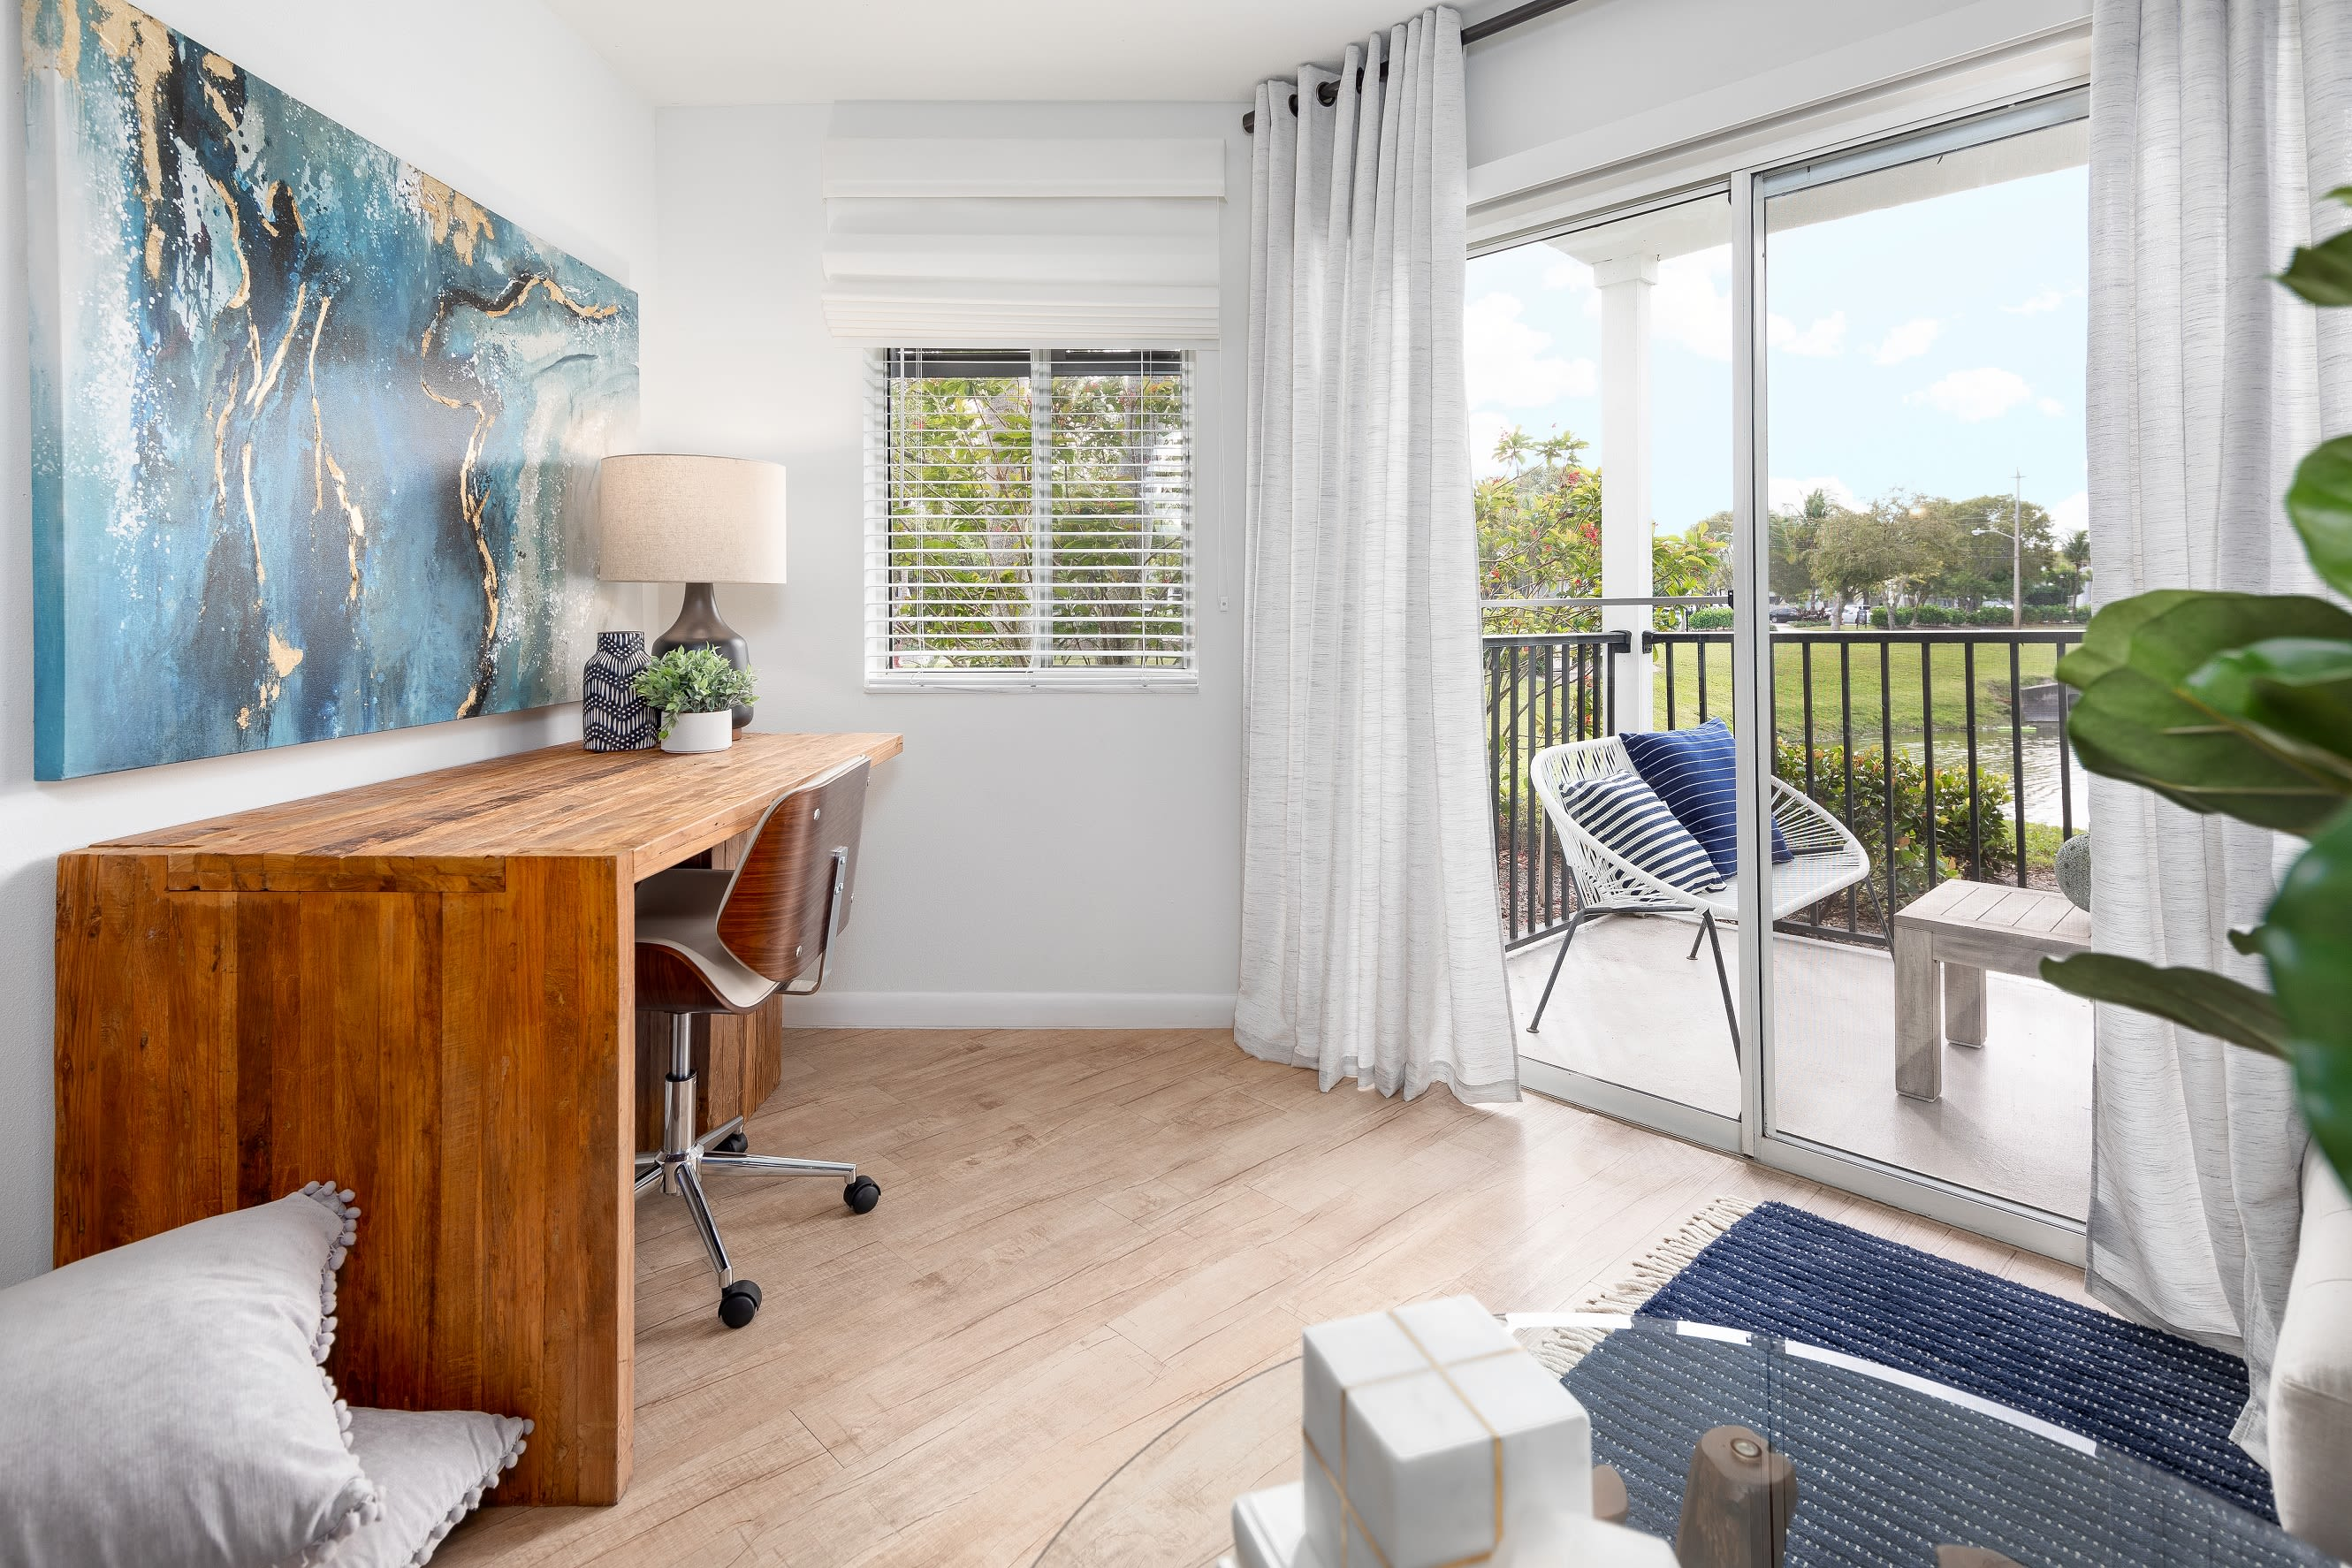 Office room with porch access at Cielo Boca in Boca Raton, Florida